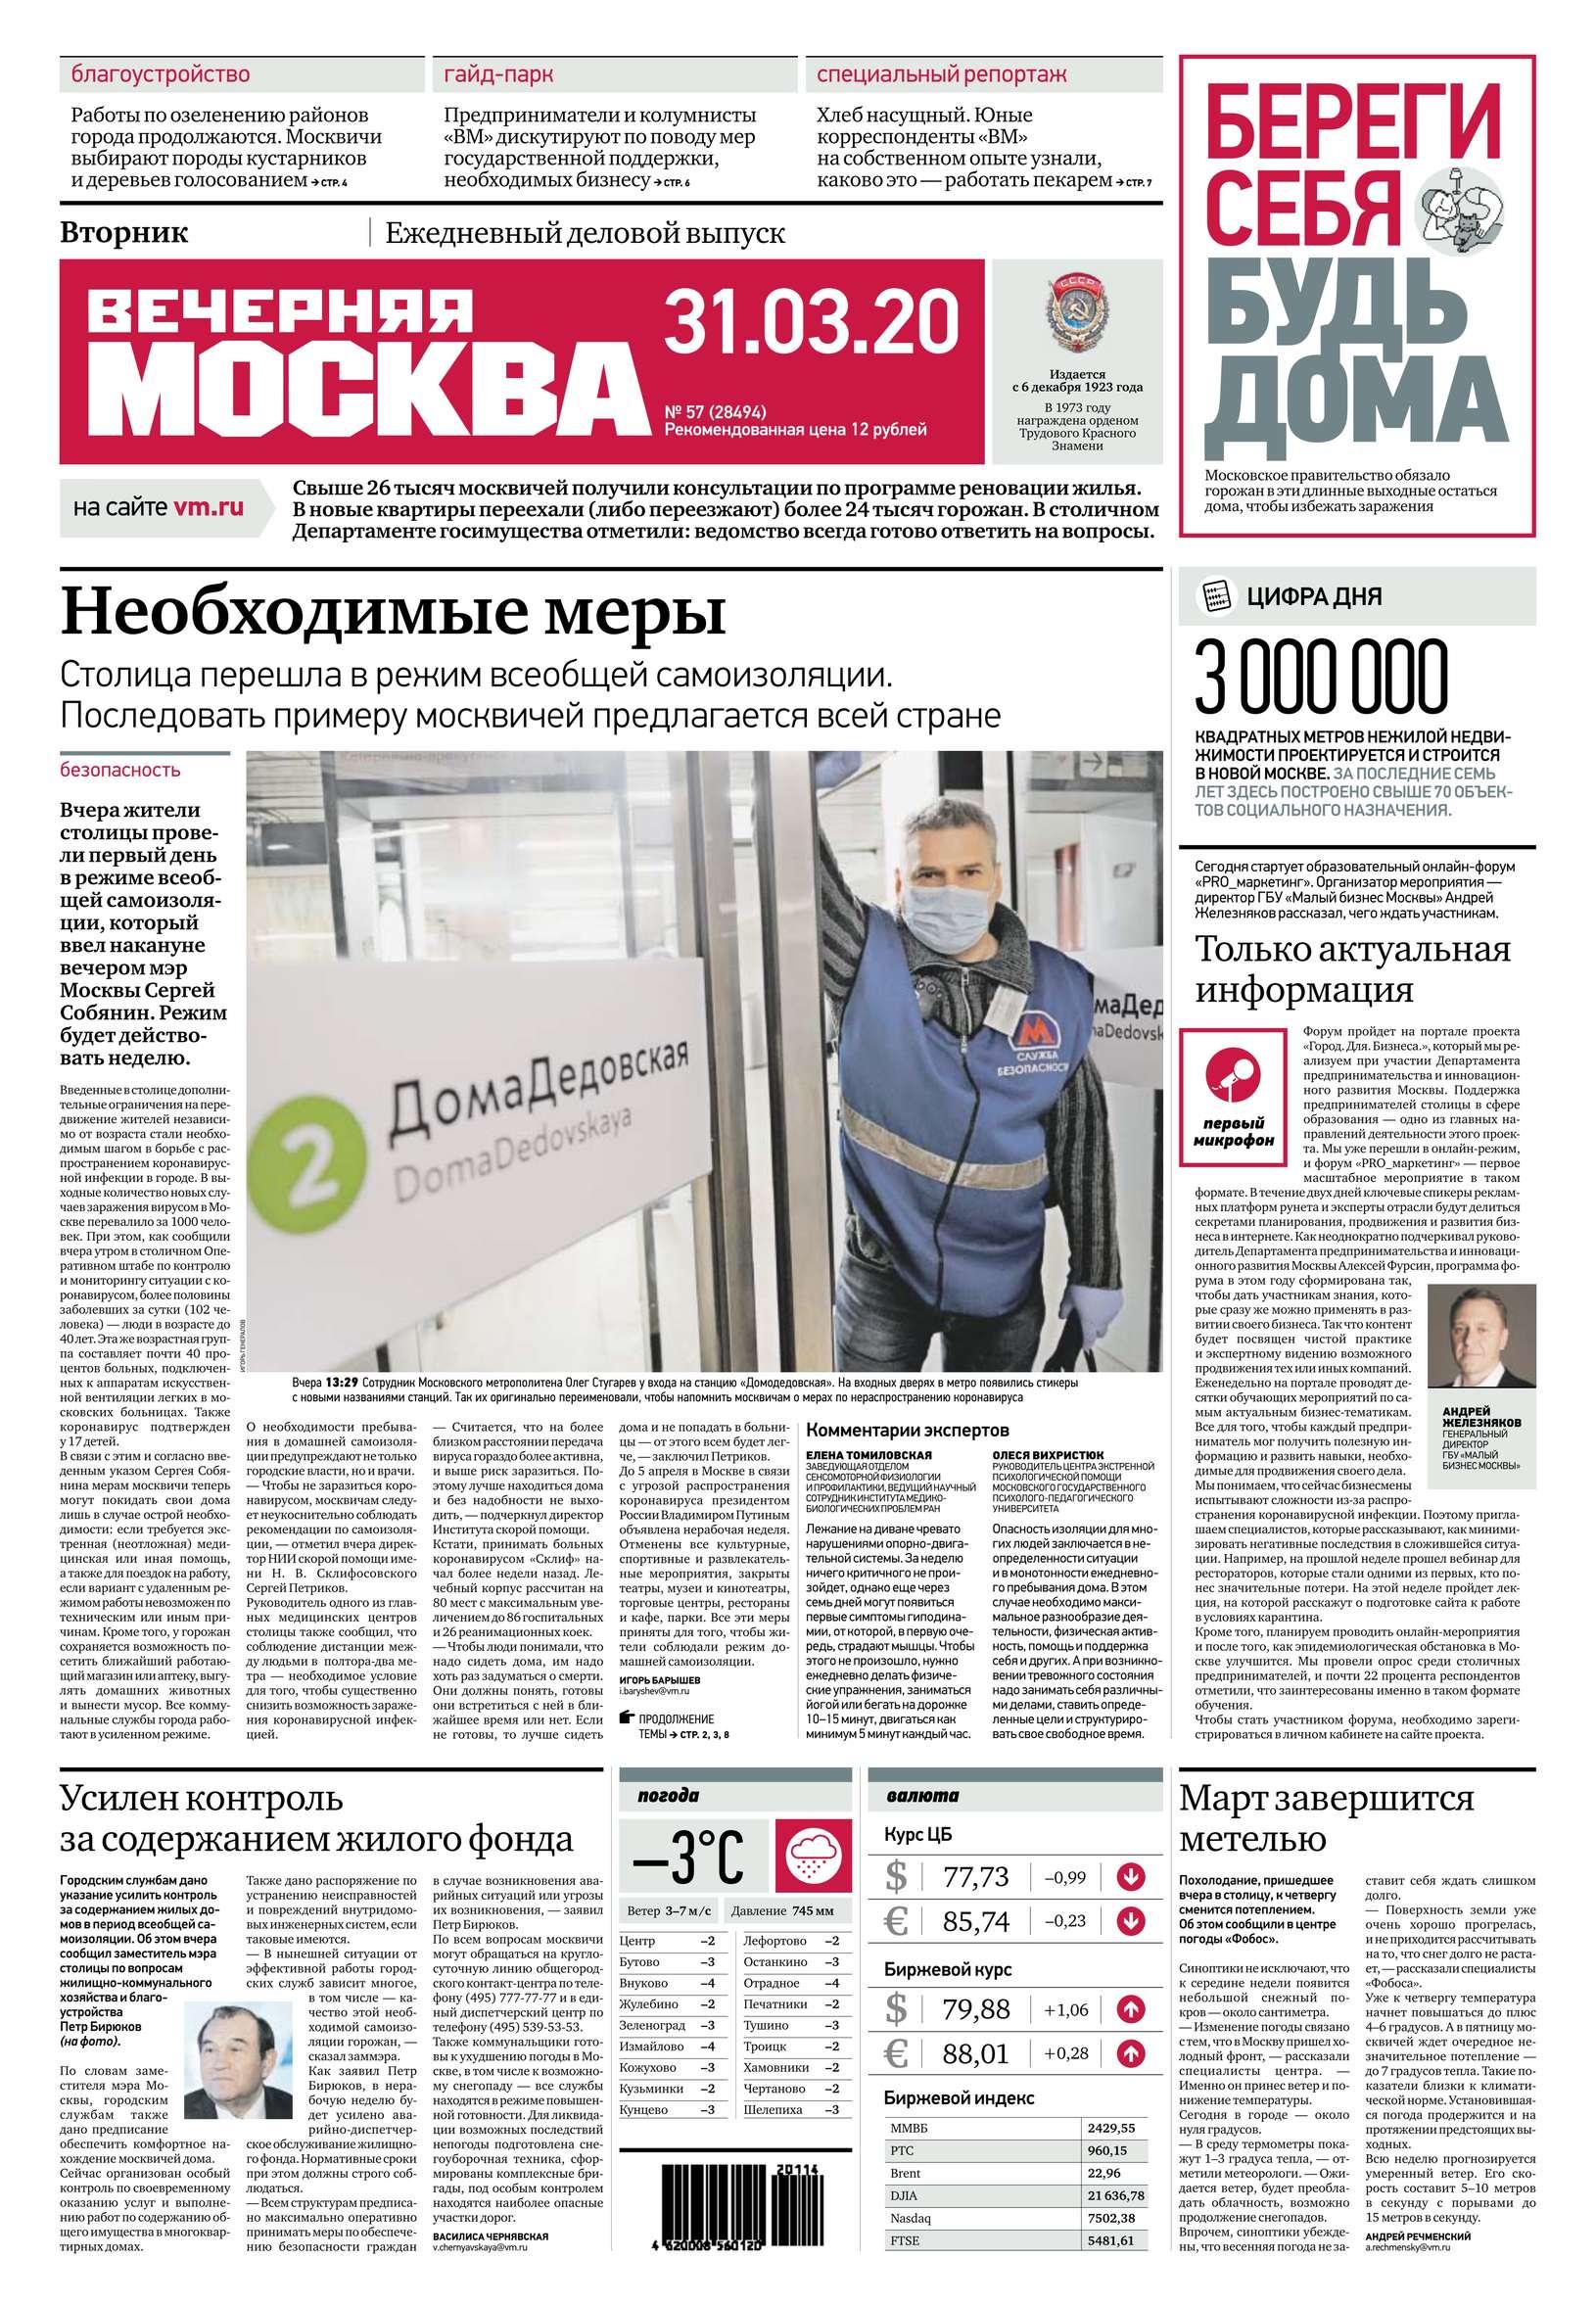 Редакция газеты Вечерняя Москва Вечерняя Москва 57-2020